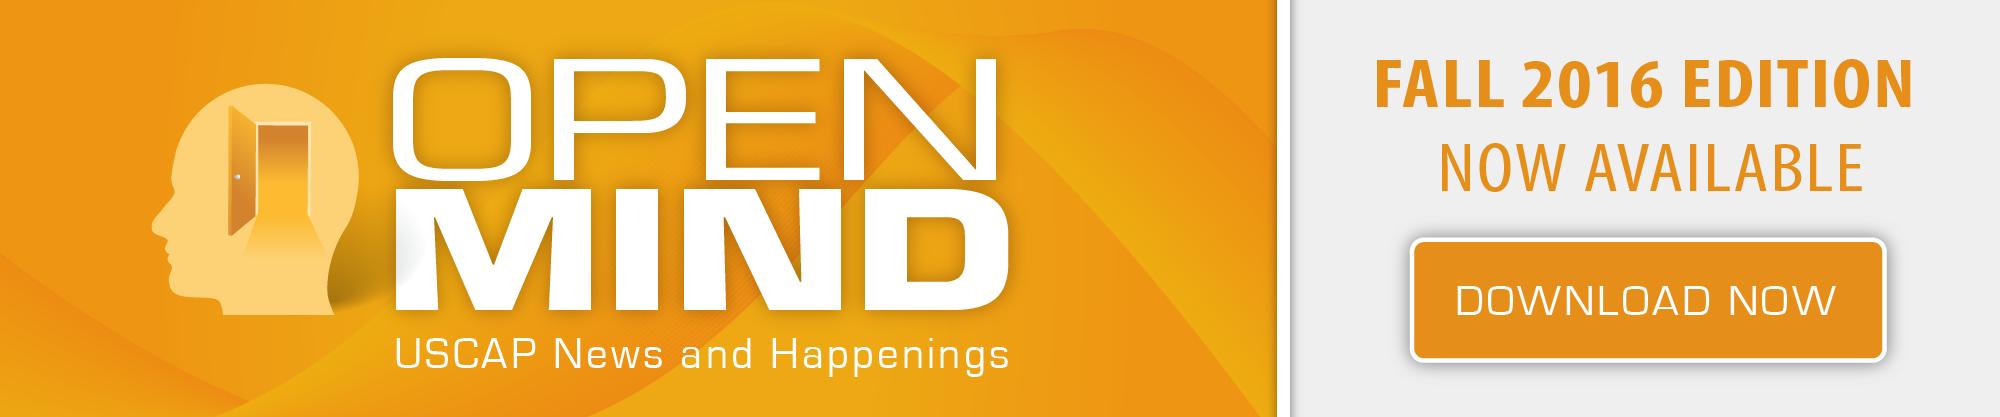 2016 Fall Open Mind